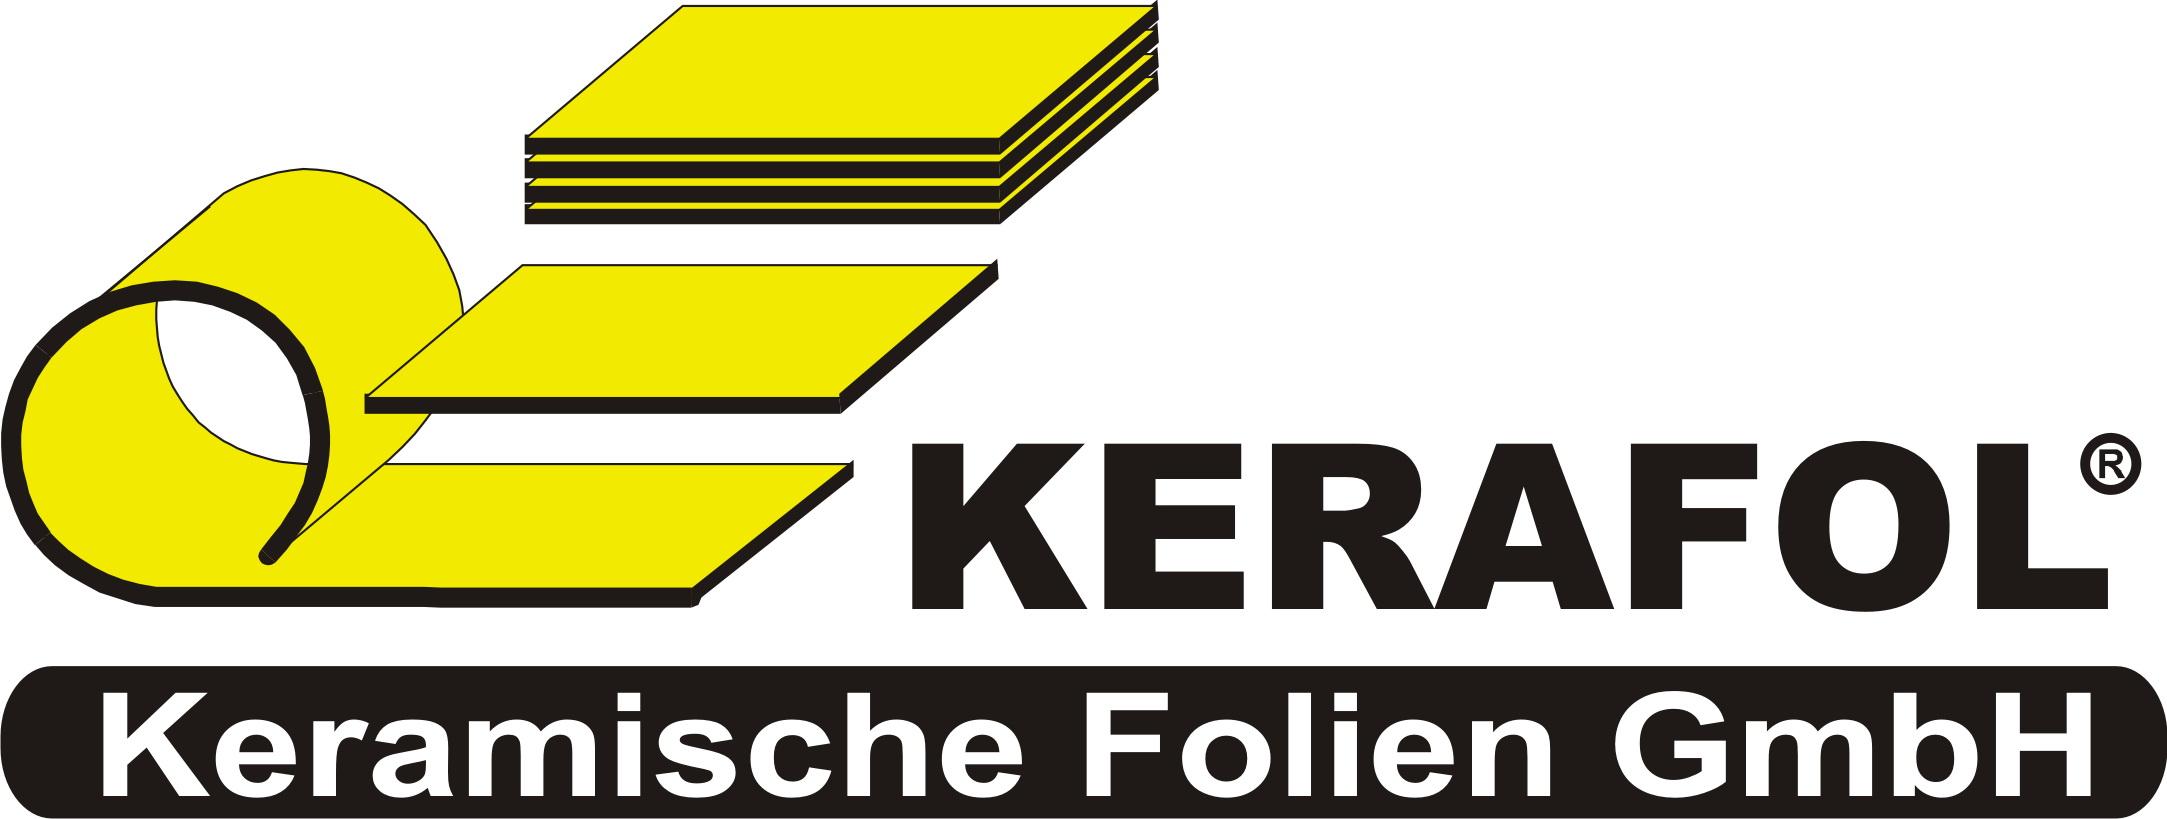 Logo_Kerafol_p1.jpg